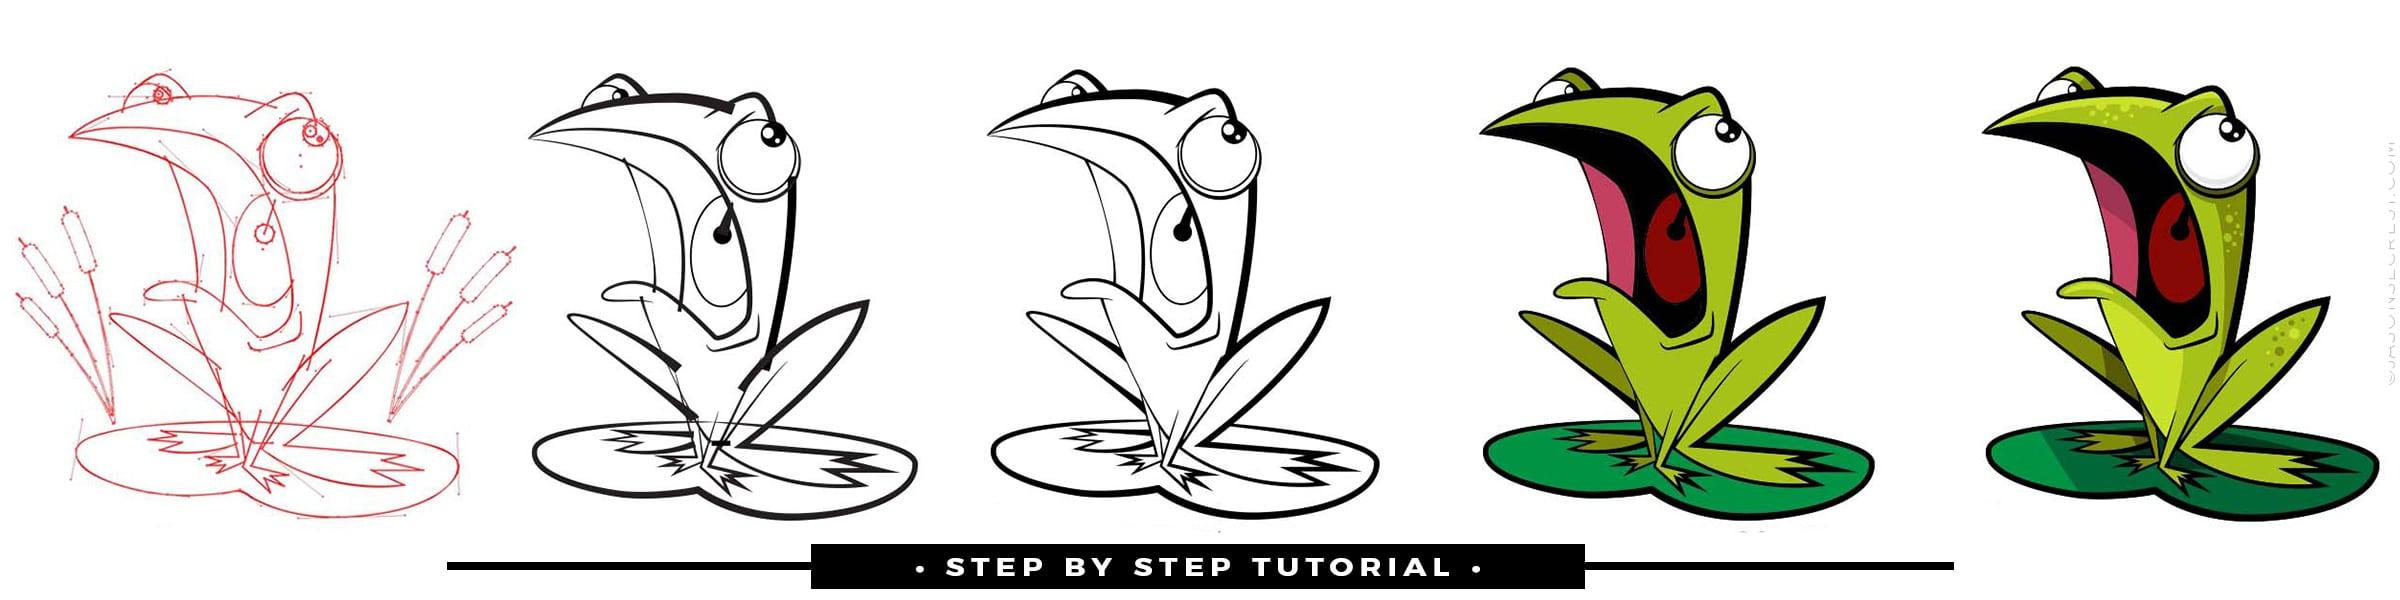 Advanced Illustrator Coloring Using Gradients Tutorial